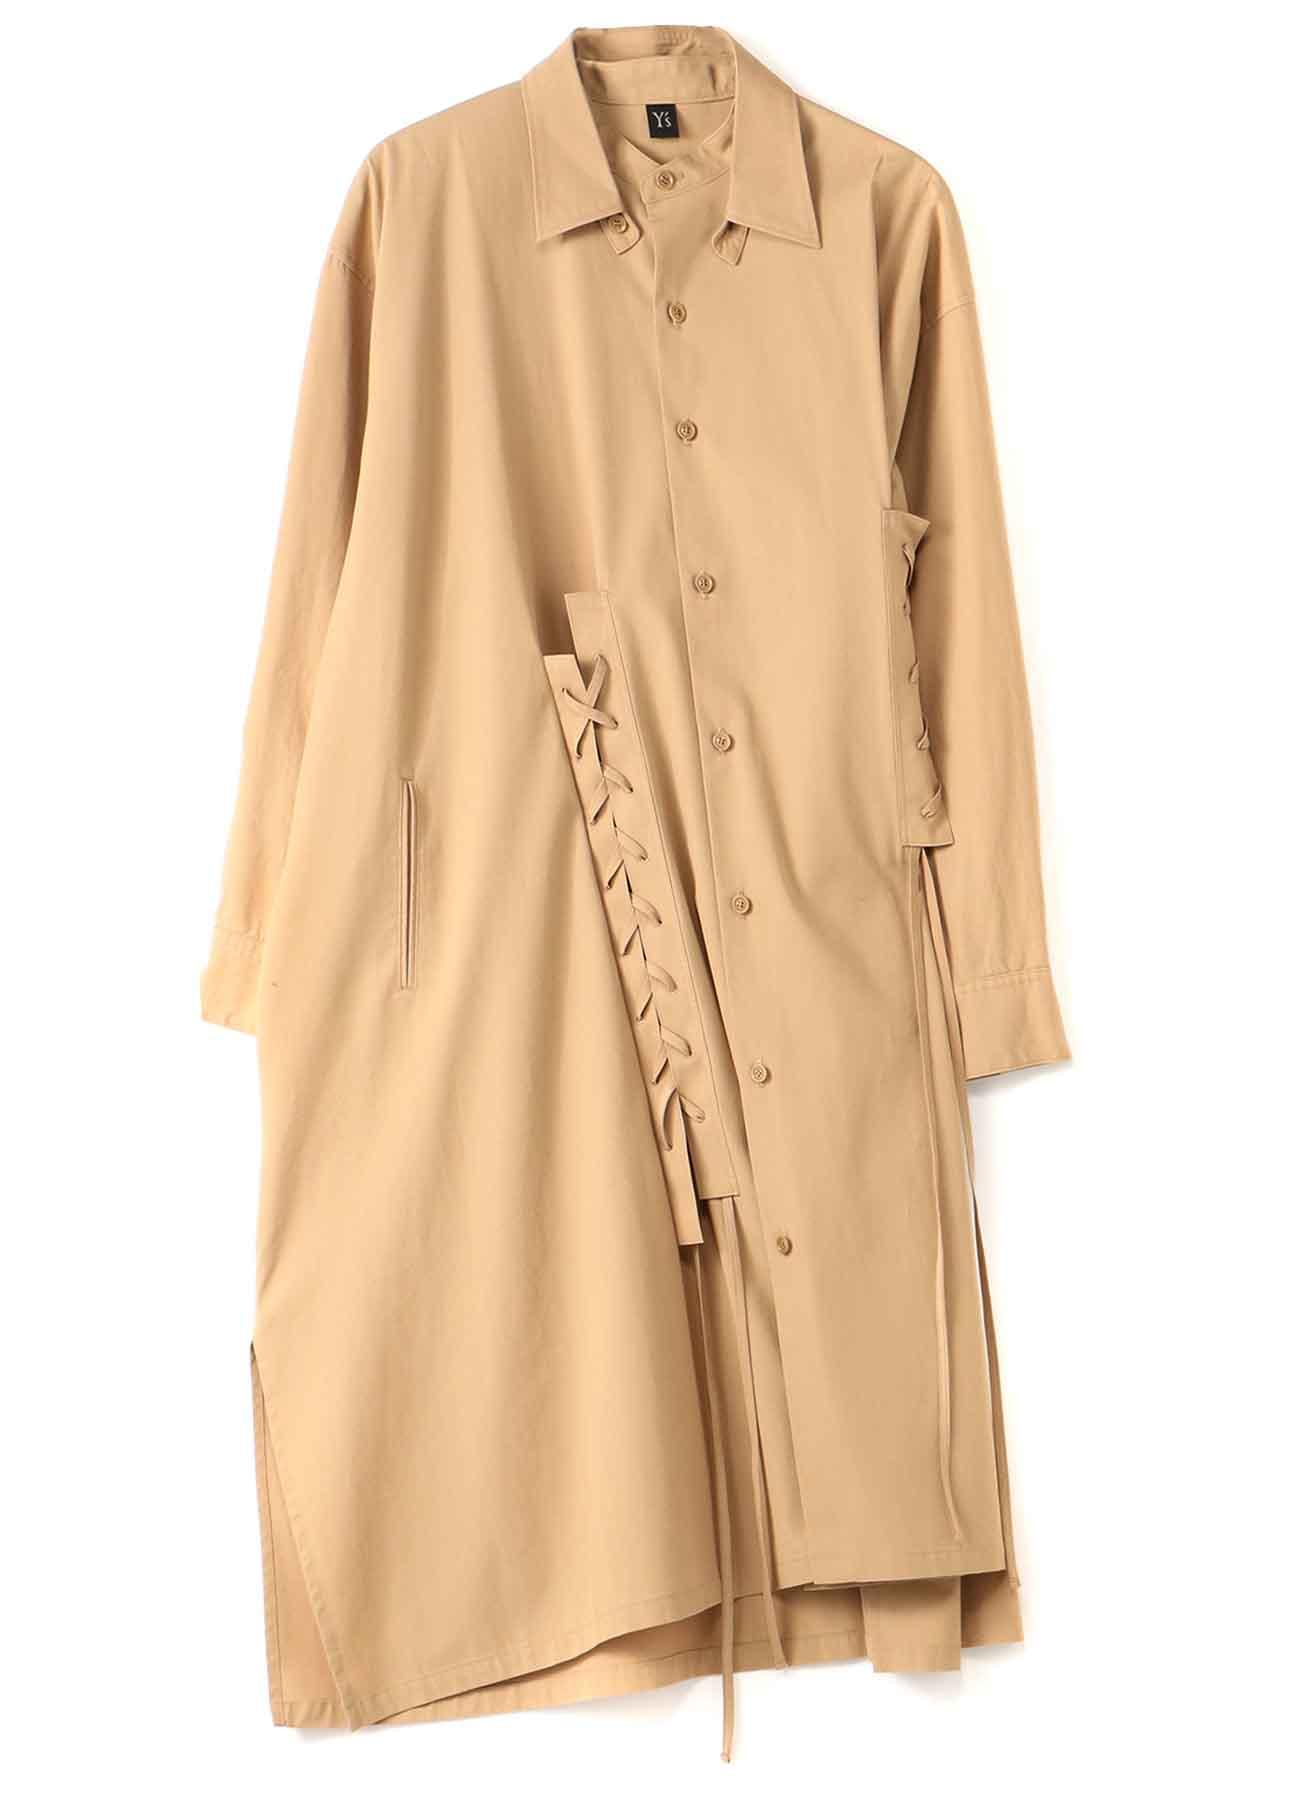 60/2 TWISTED GABARDINE LACE UP DRESS